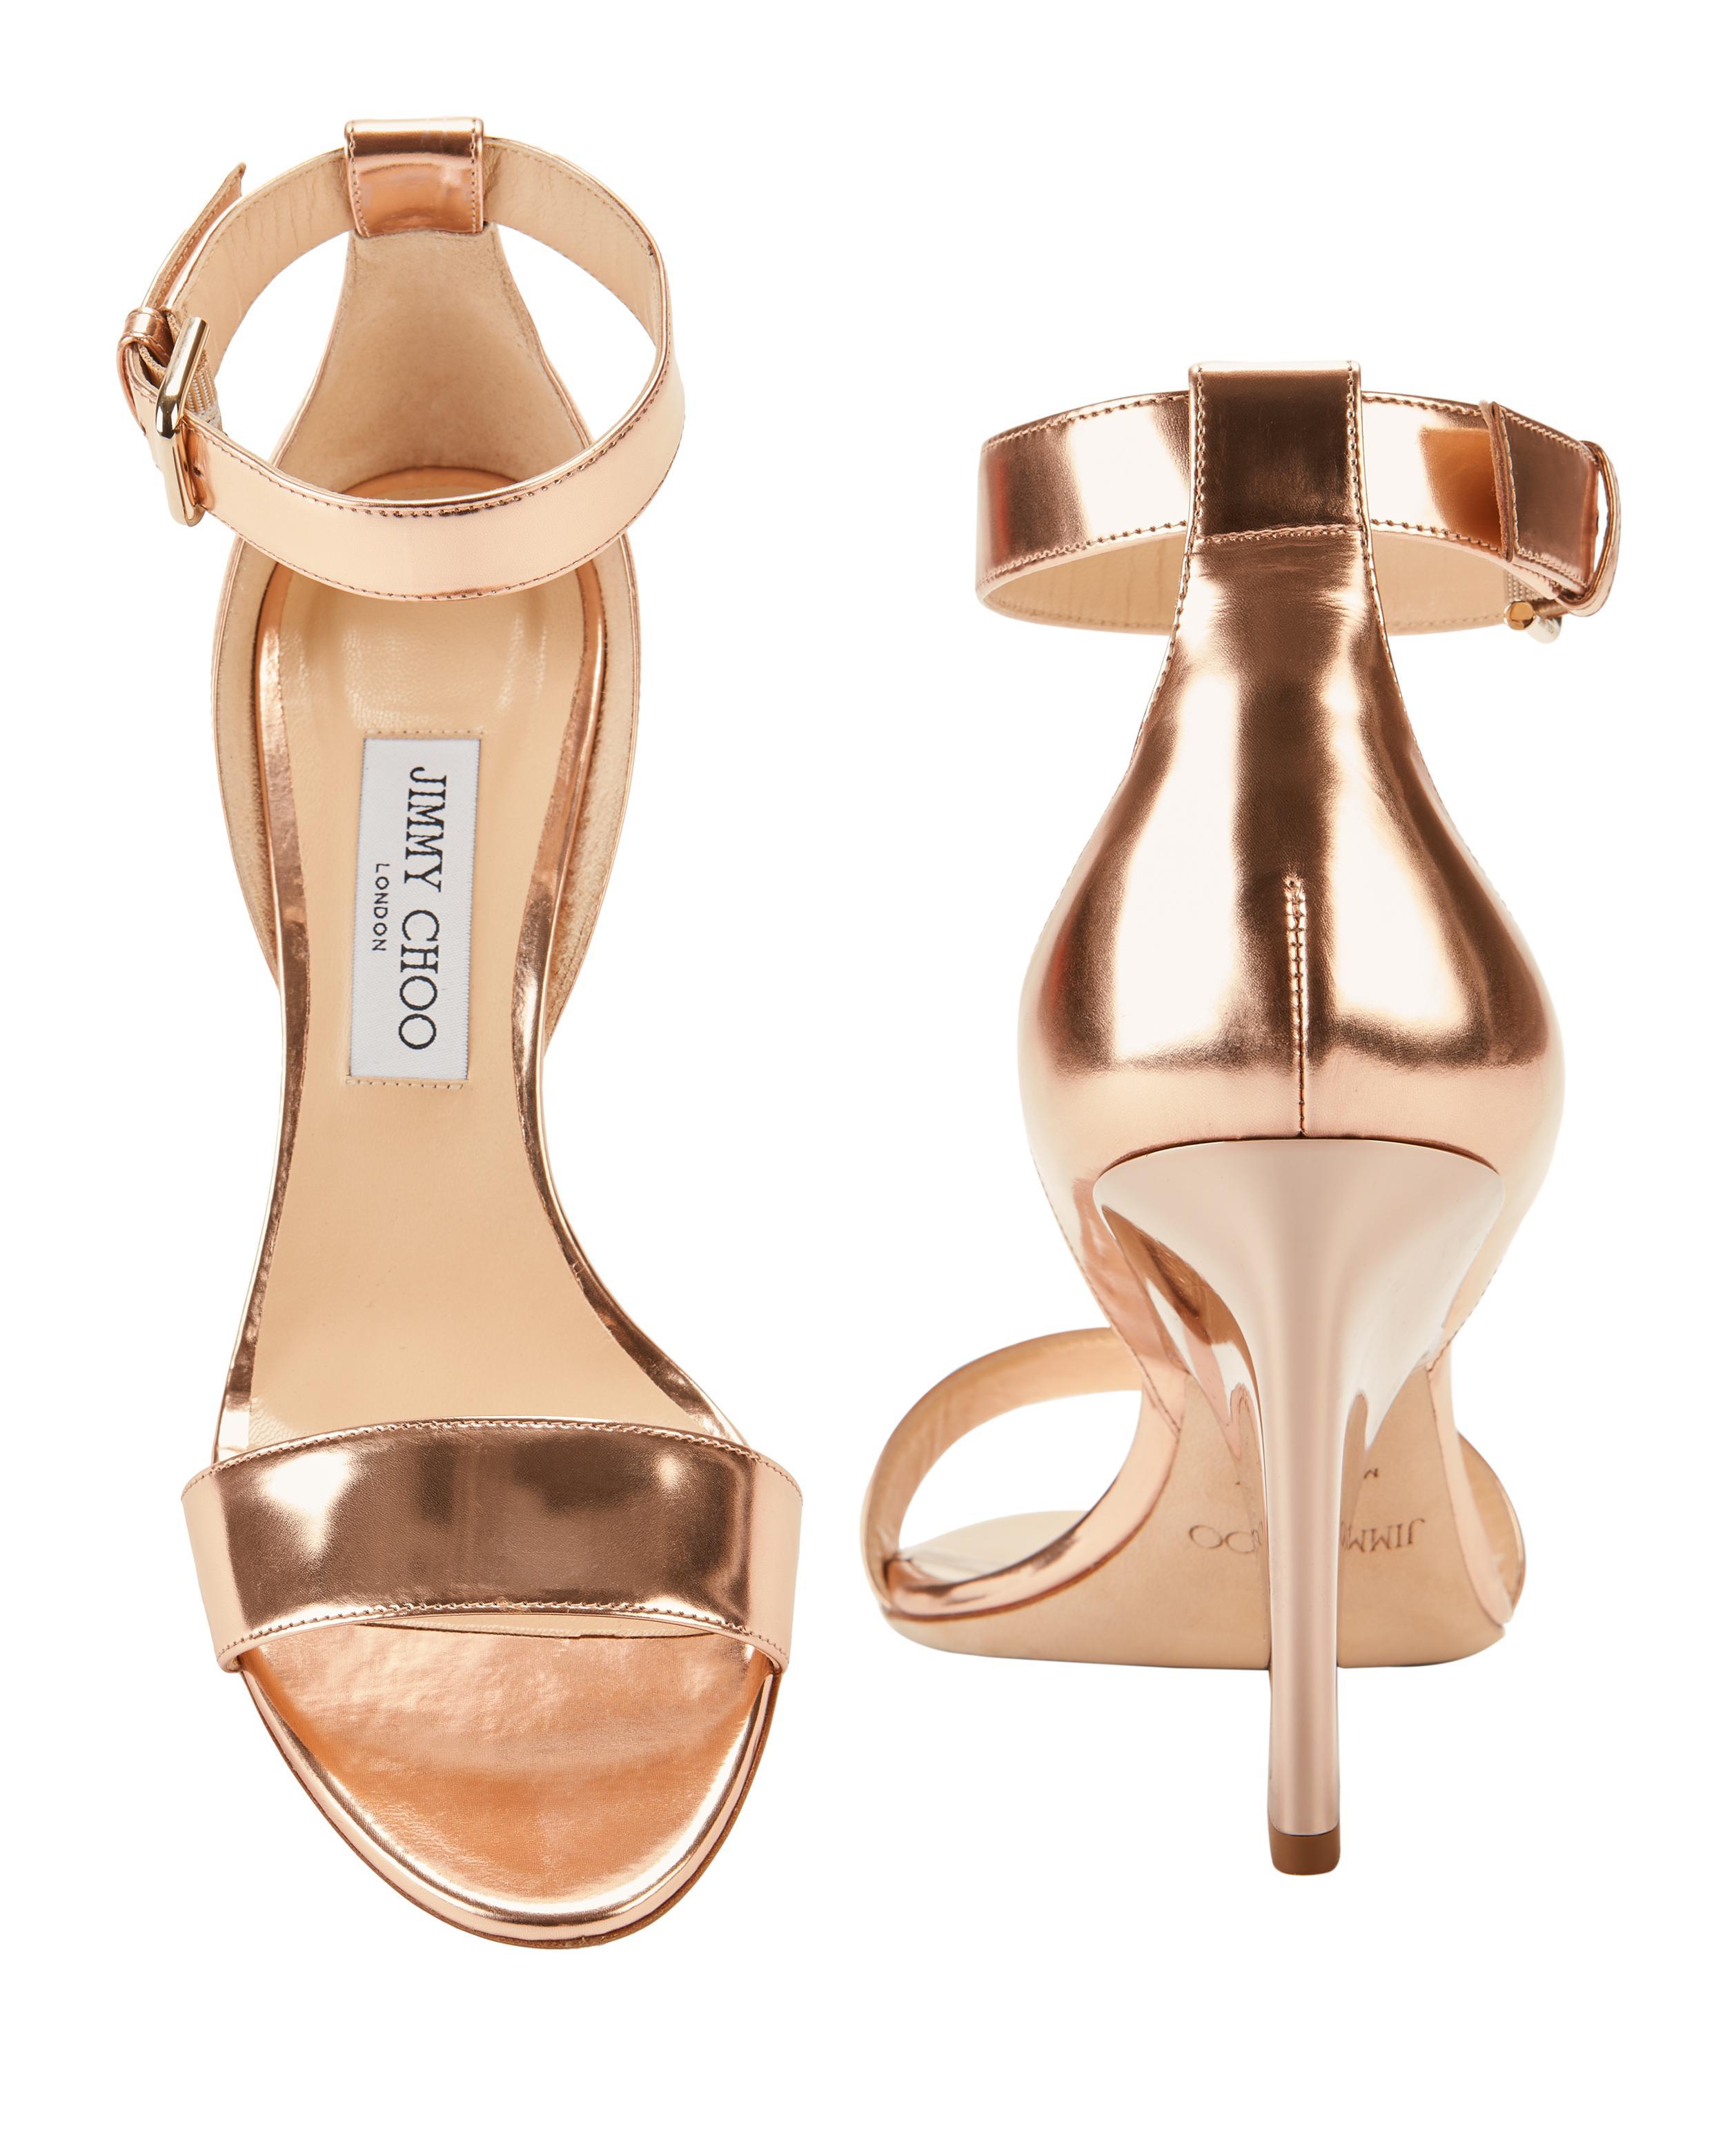 42474335c8bd Lyst - Jimmy Choo Edina Rose Gold Sandals